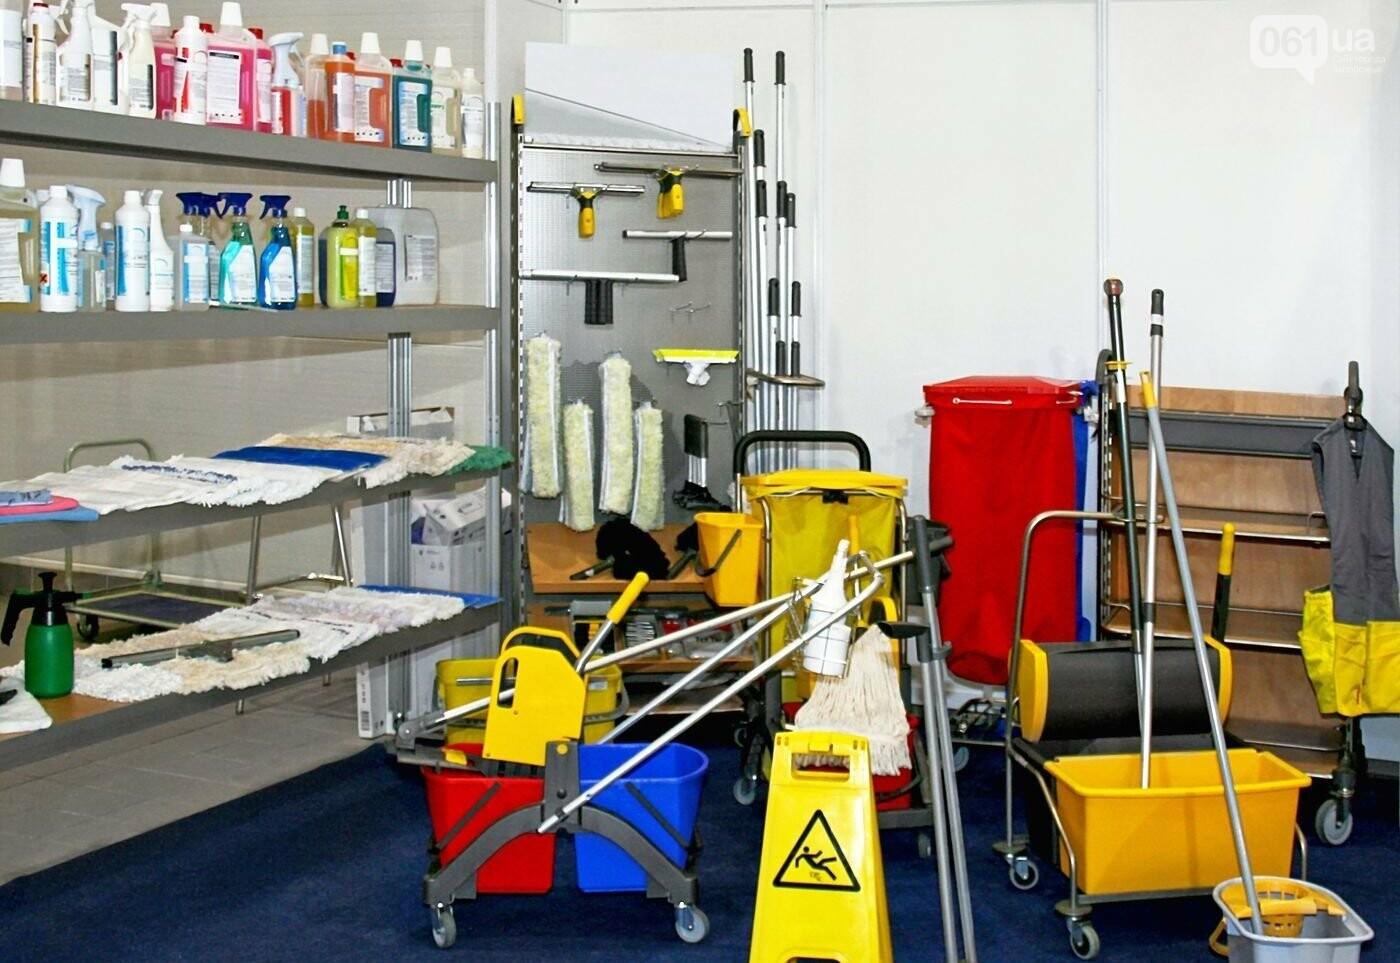 Техника и средства для уборки квартиры, фото-1